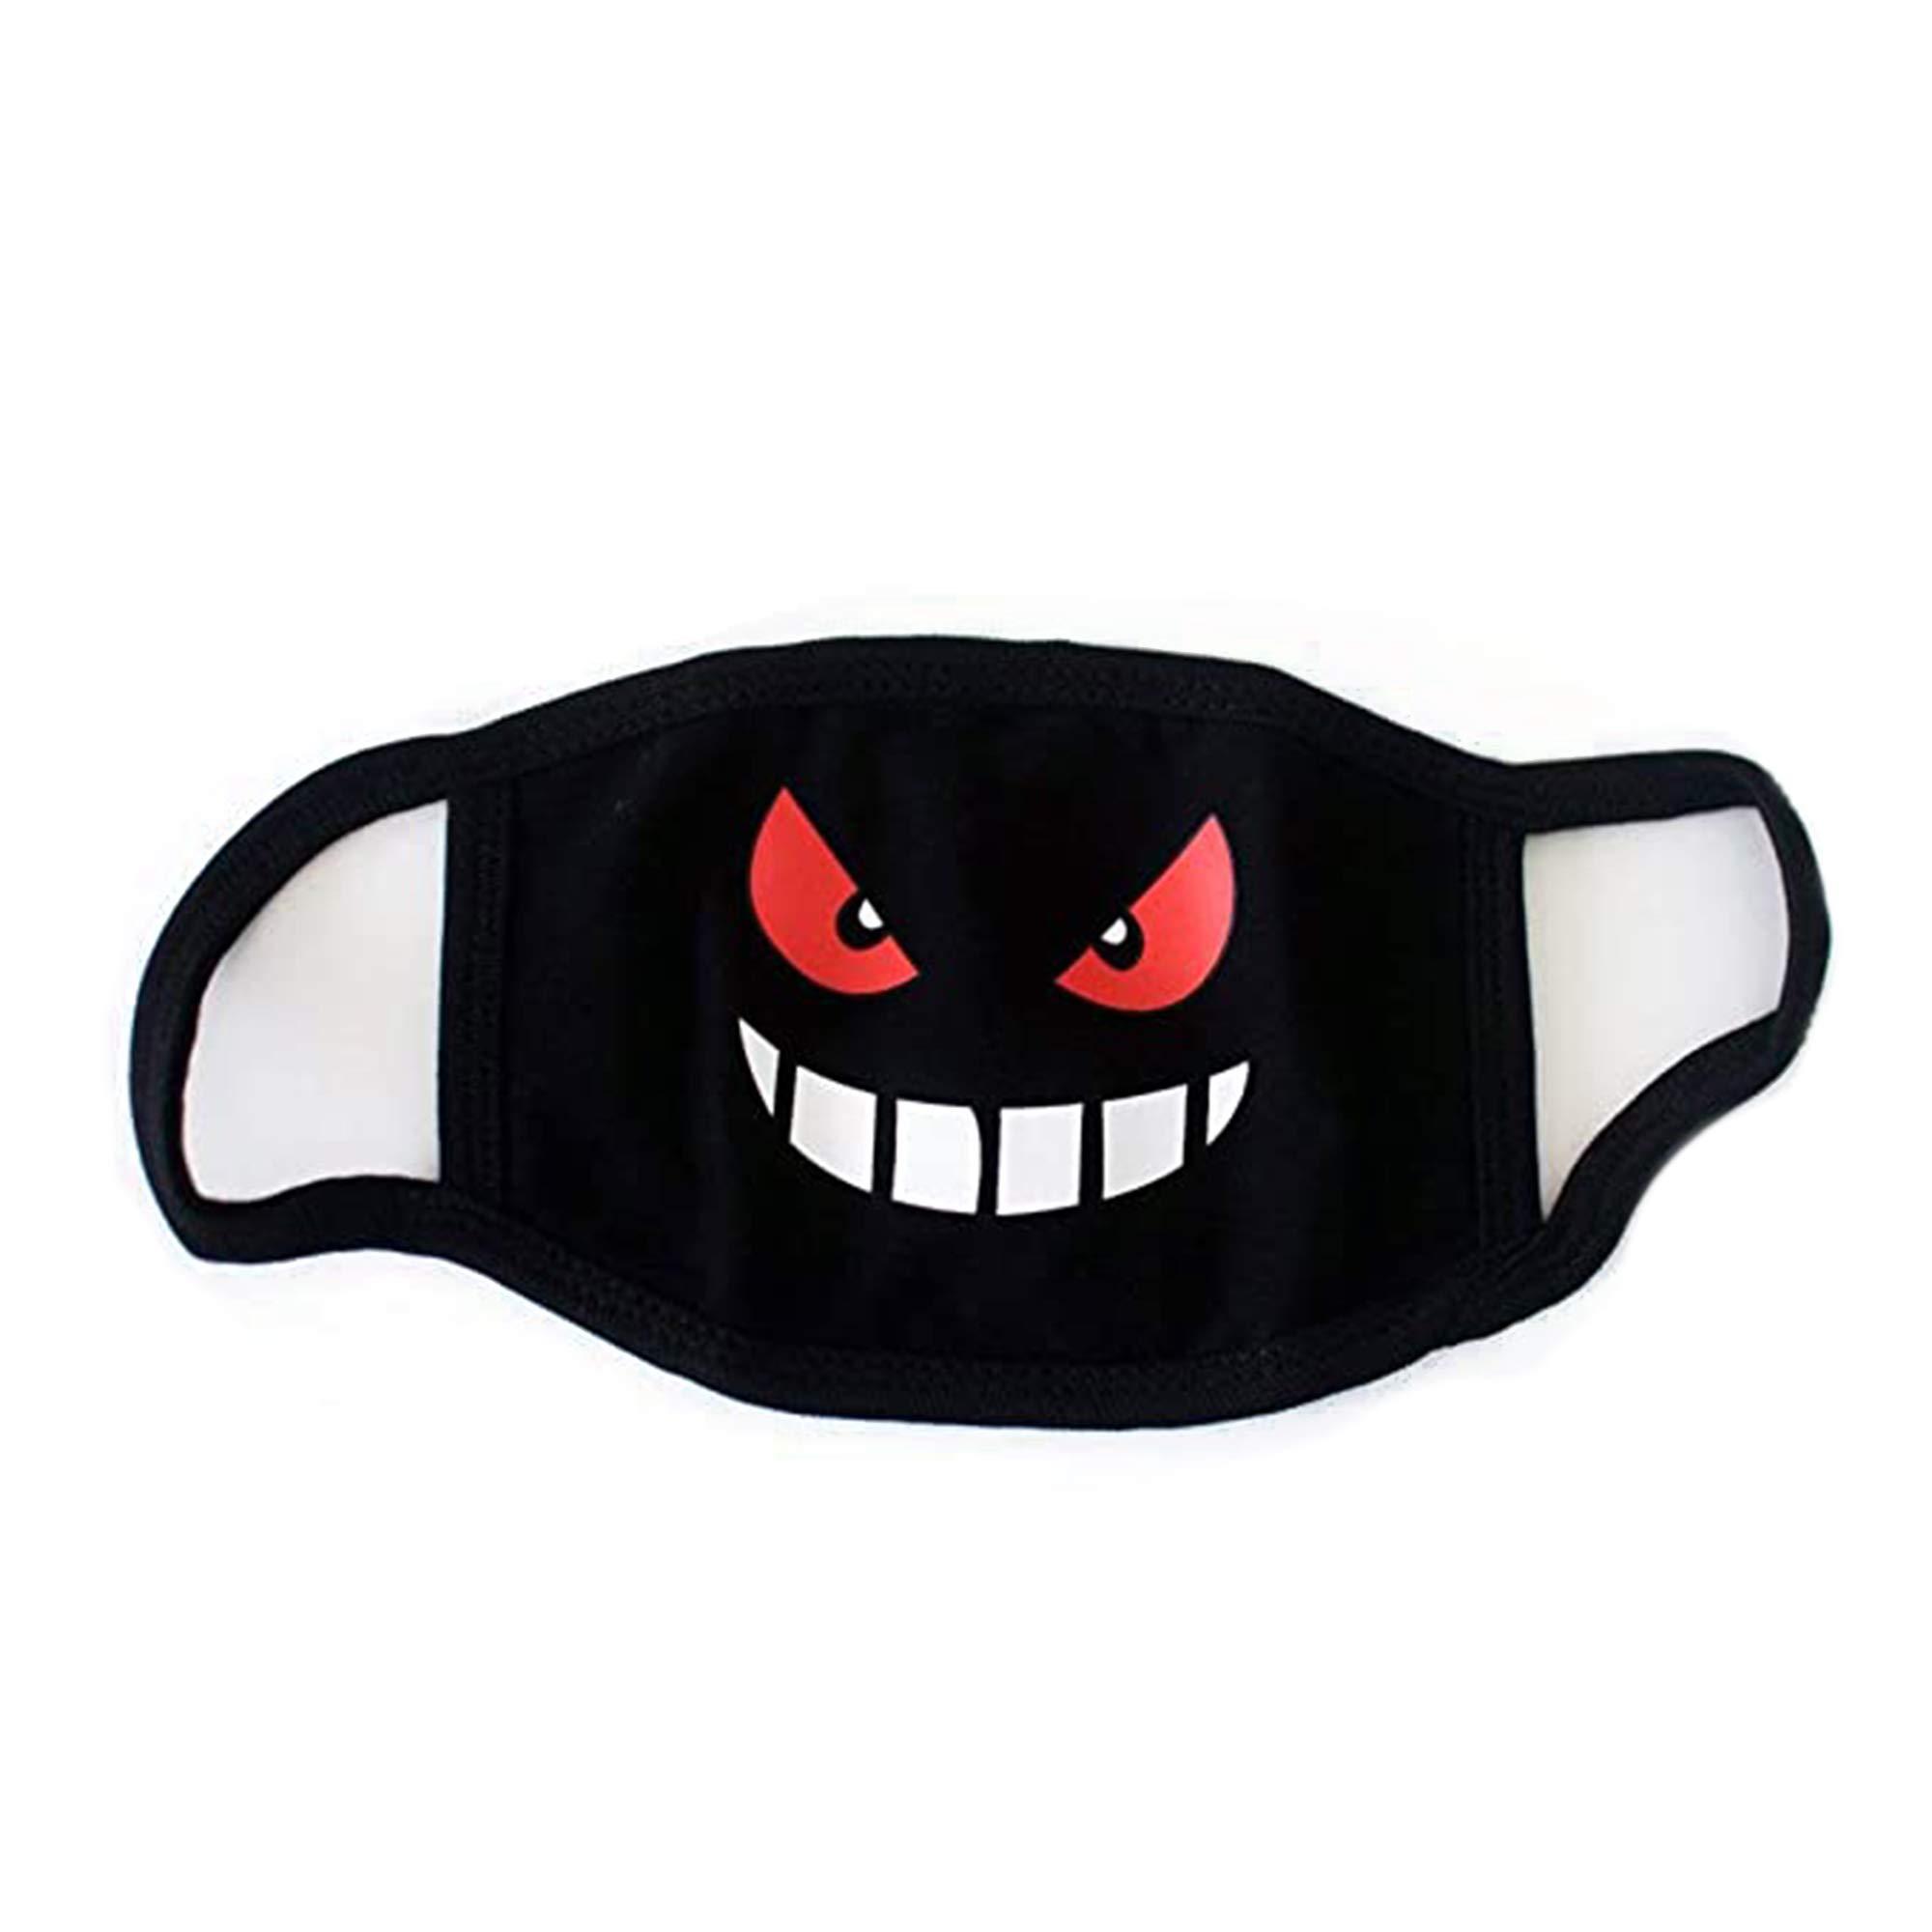 COOLINKO Face Cosplay Costume Black Cotton Cartoon Anime Cute Mouth Head Fashion Accessory (#53)